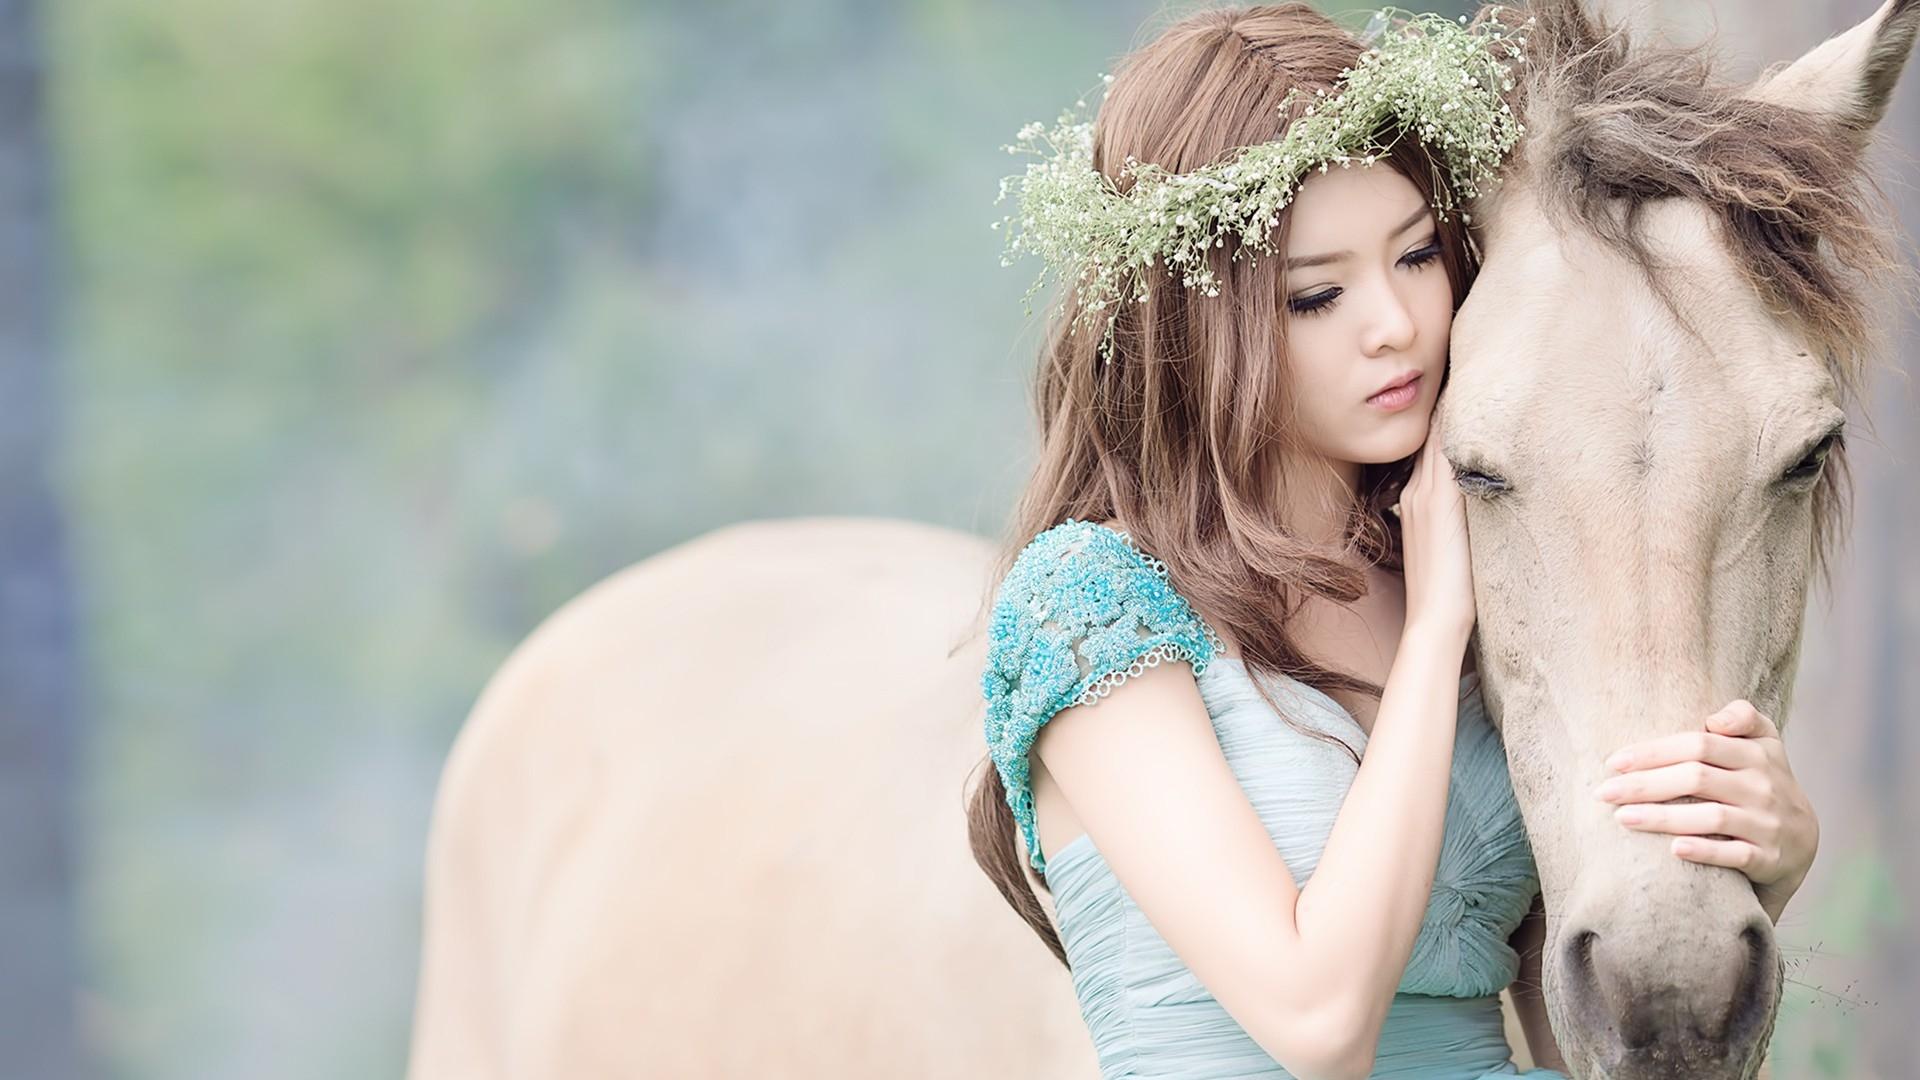 Download Wallpaper 1920x1080 girl, asian, horse, wreath